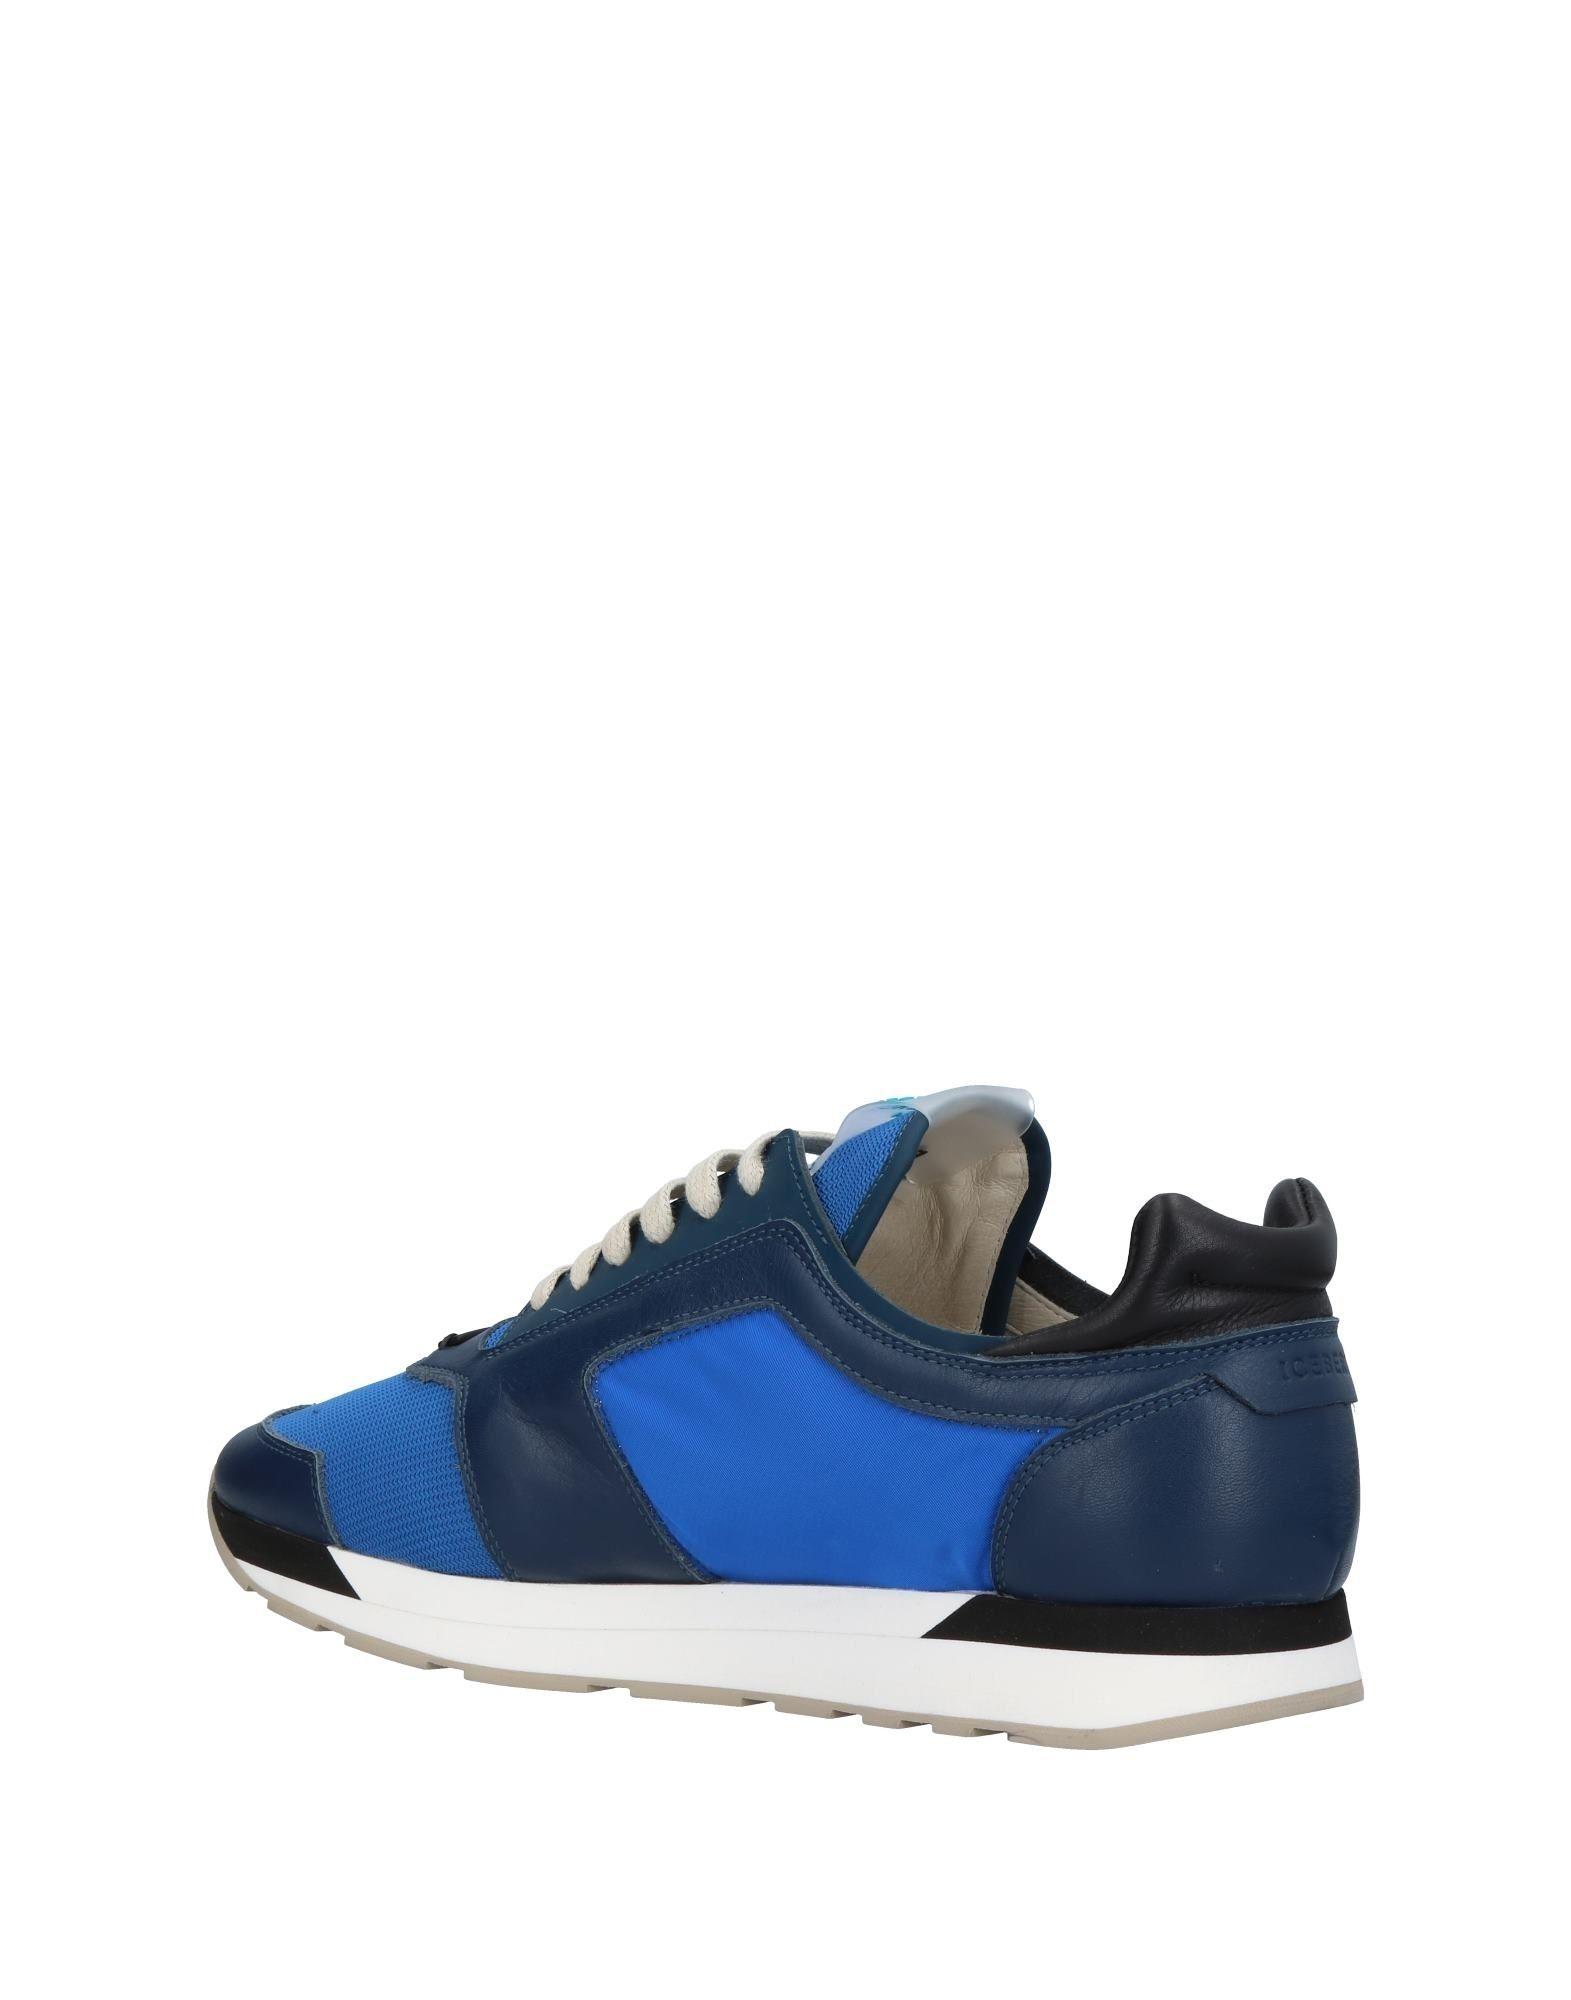 A buon mercato Sneakers Iceberg Uomo - 11390757JV